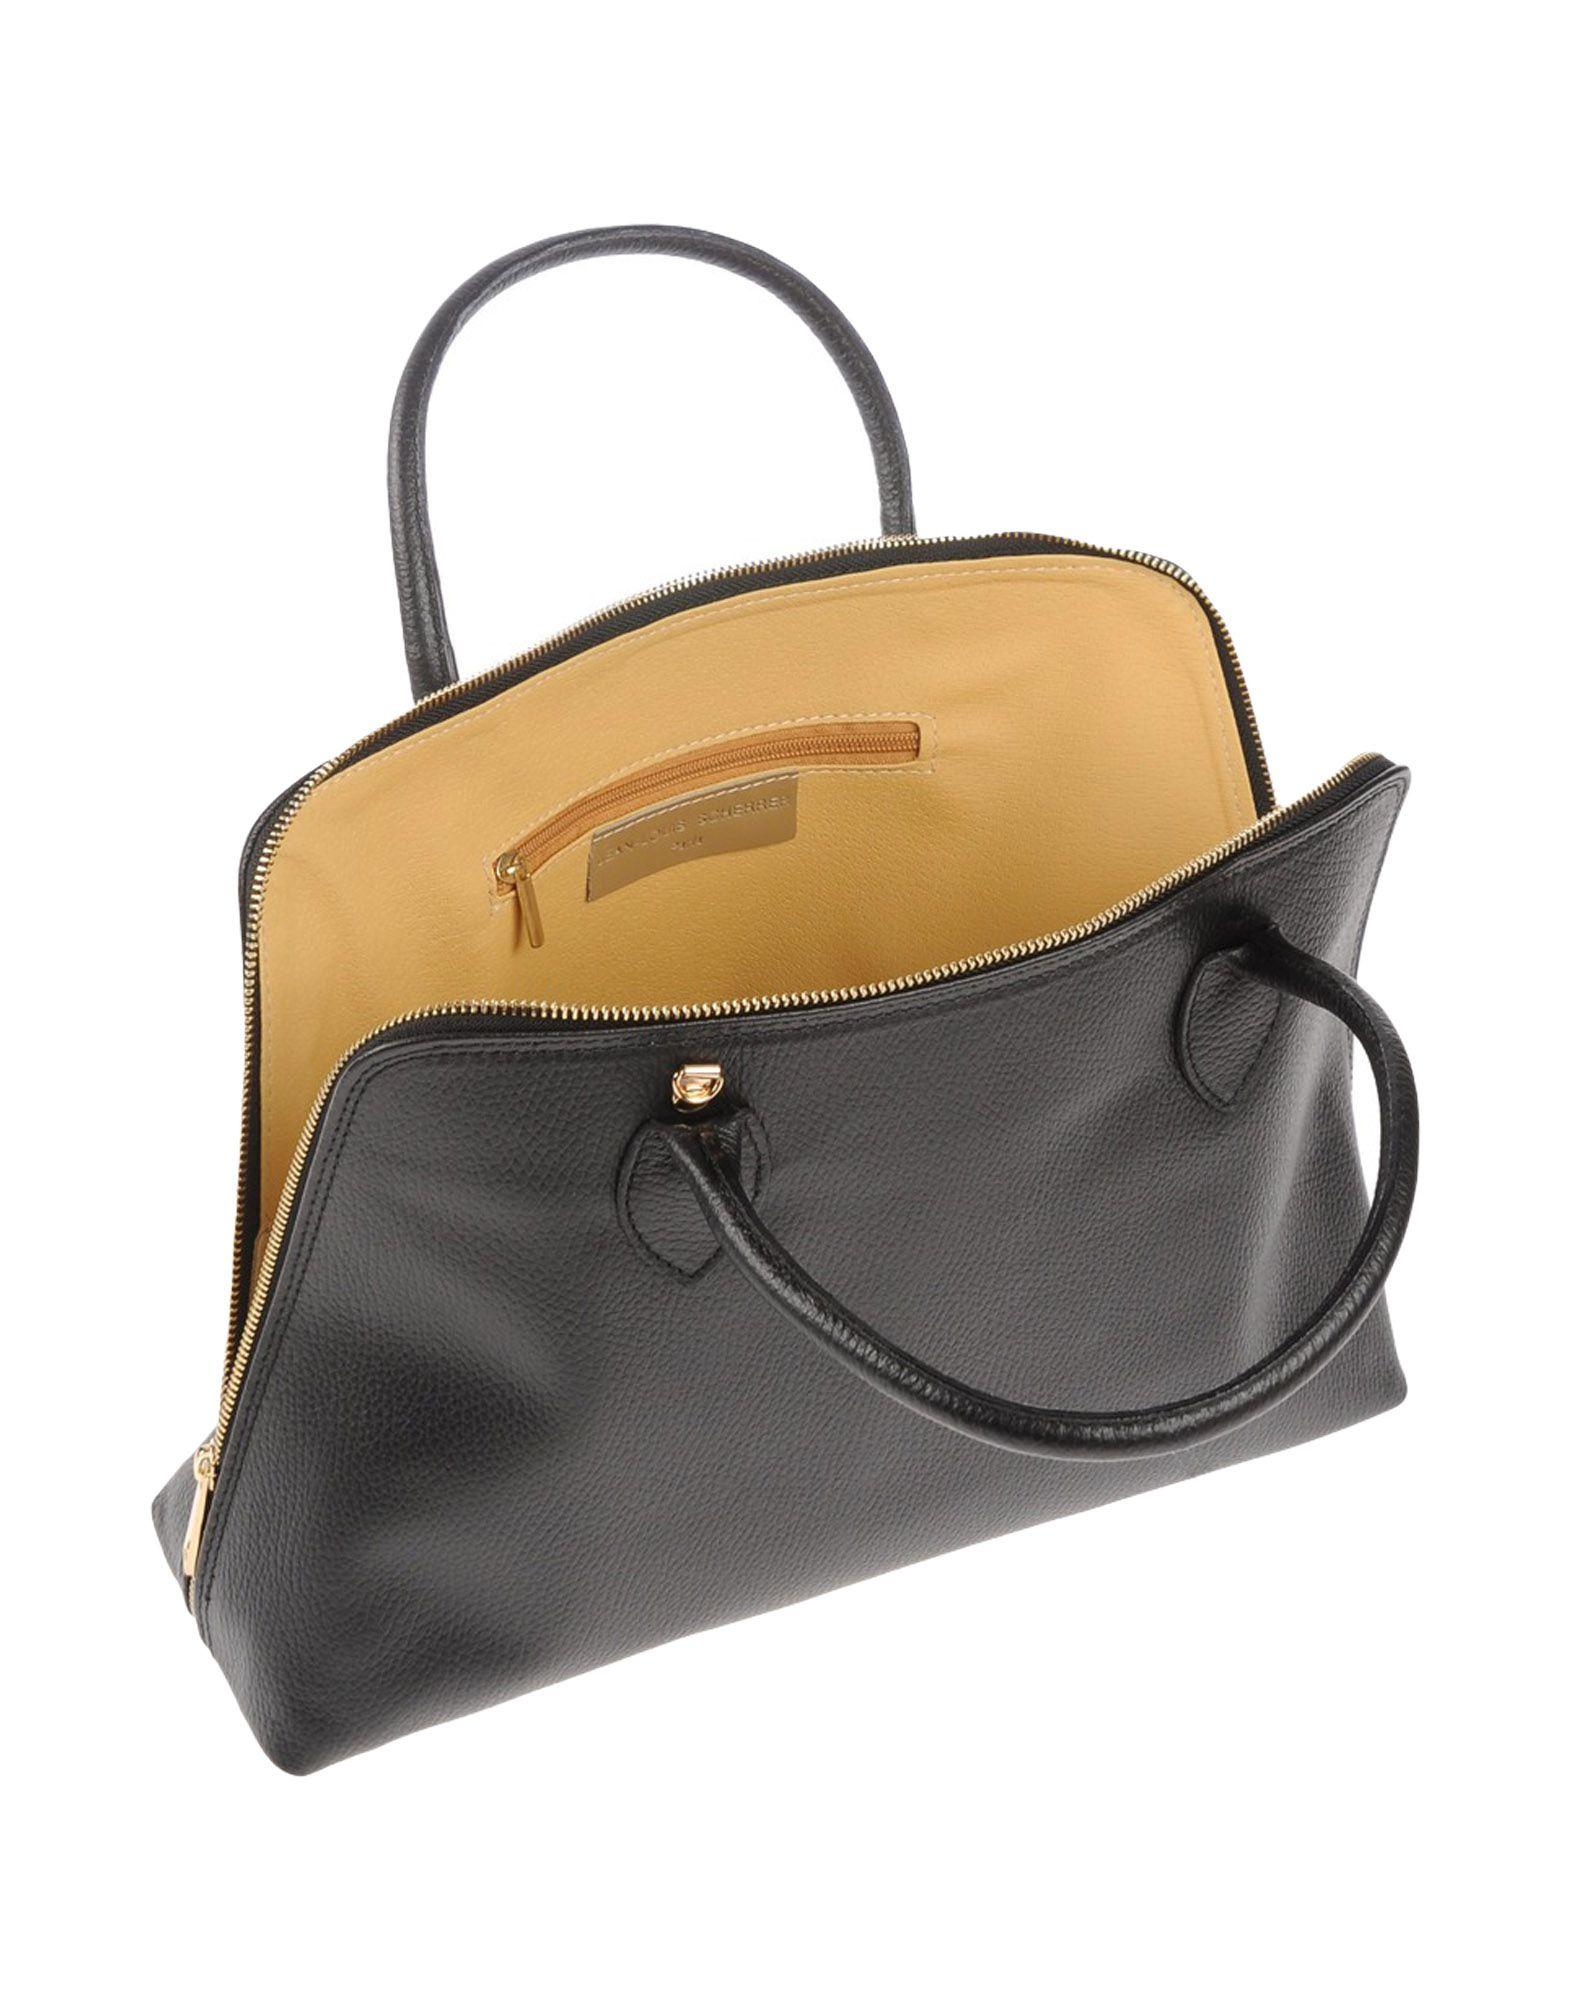 jean louis scherrer handbag in black lyst. Black Bedroom Furniture Sets. Home Design Ideas